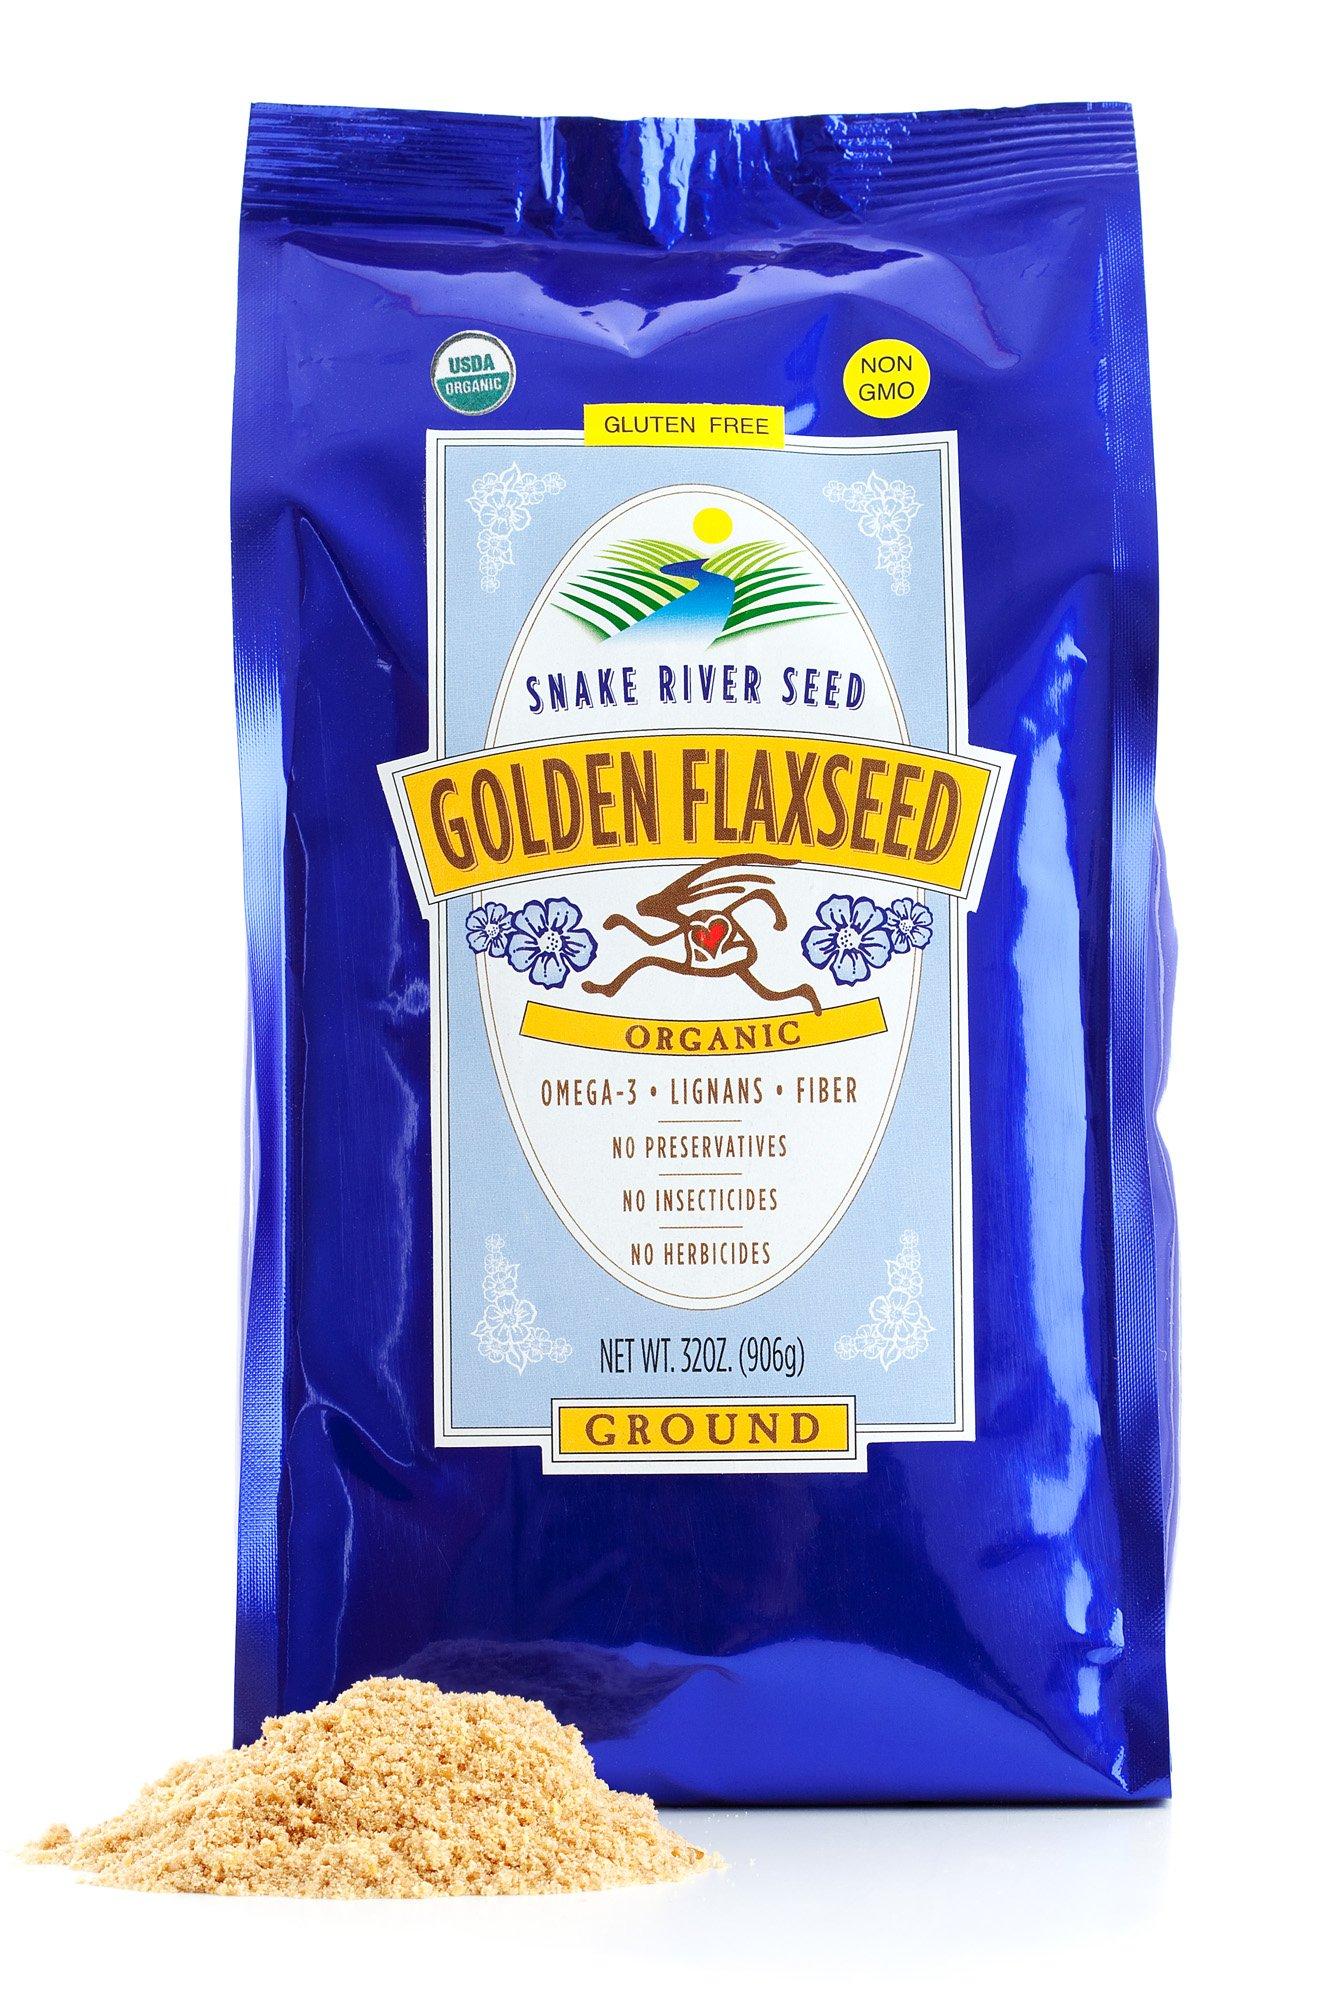 Farm Fresh 100% Natural Golden Flax Seed, 2lb, Freshly Ground, Organic, Gluten-Free, Non-GMO, Nutty Flavor